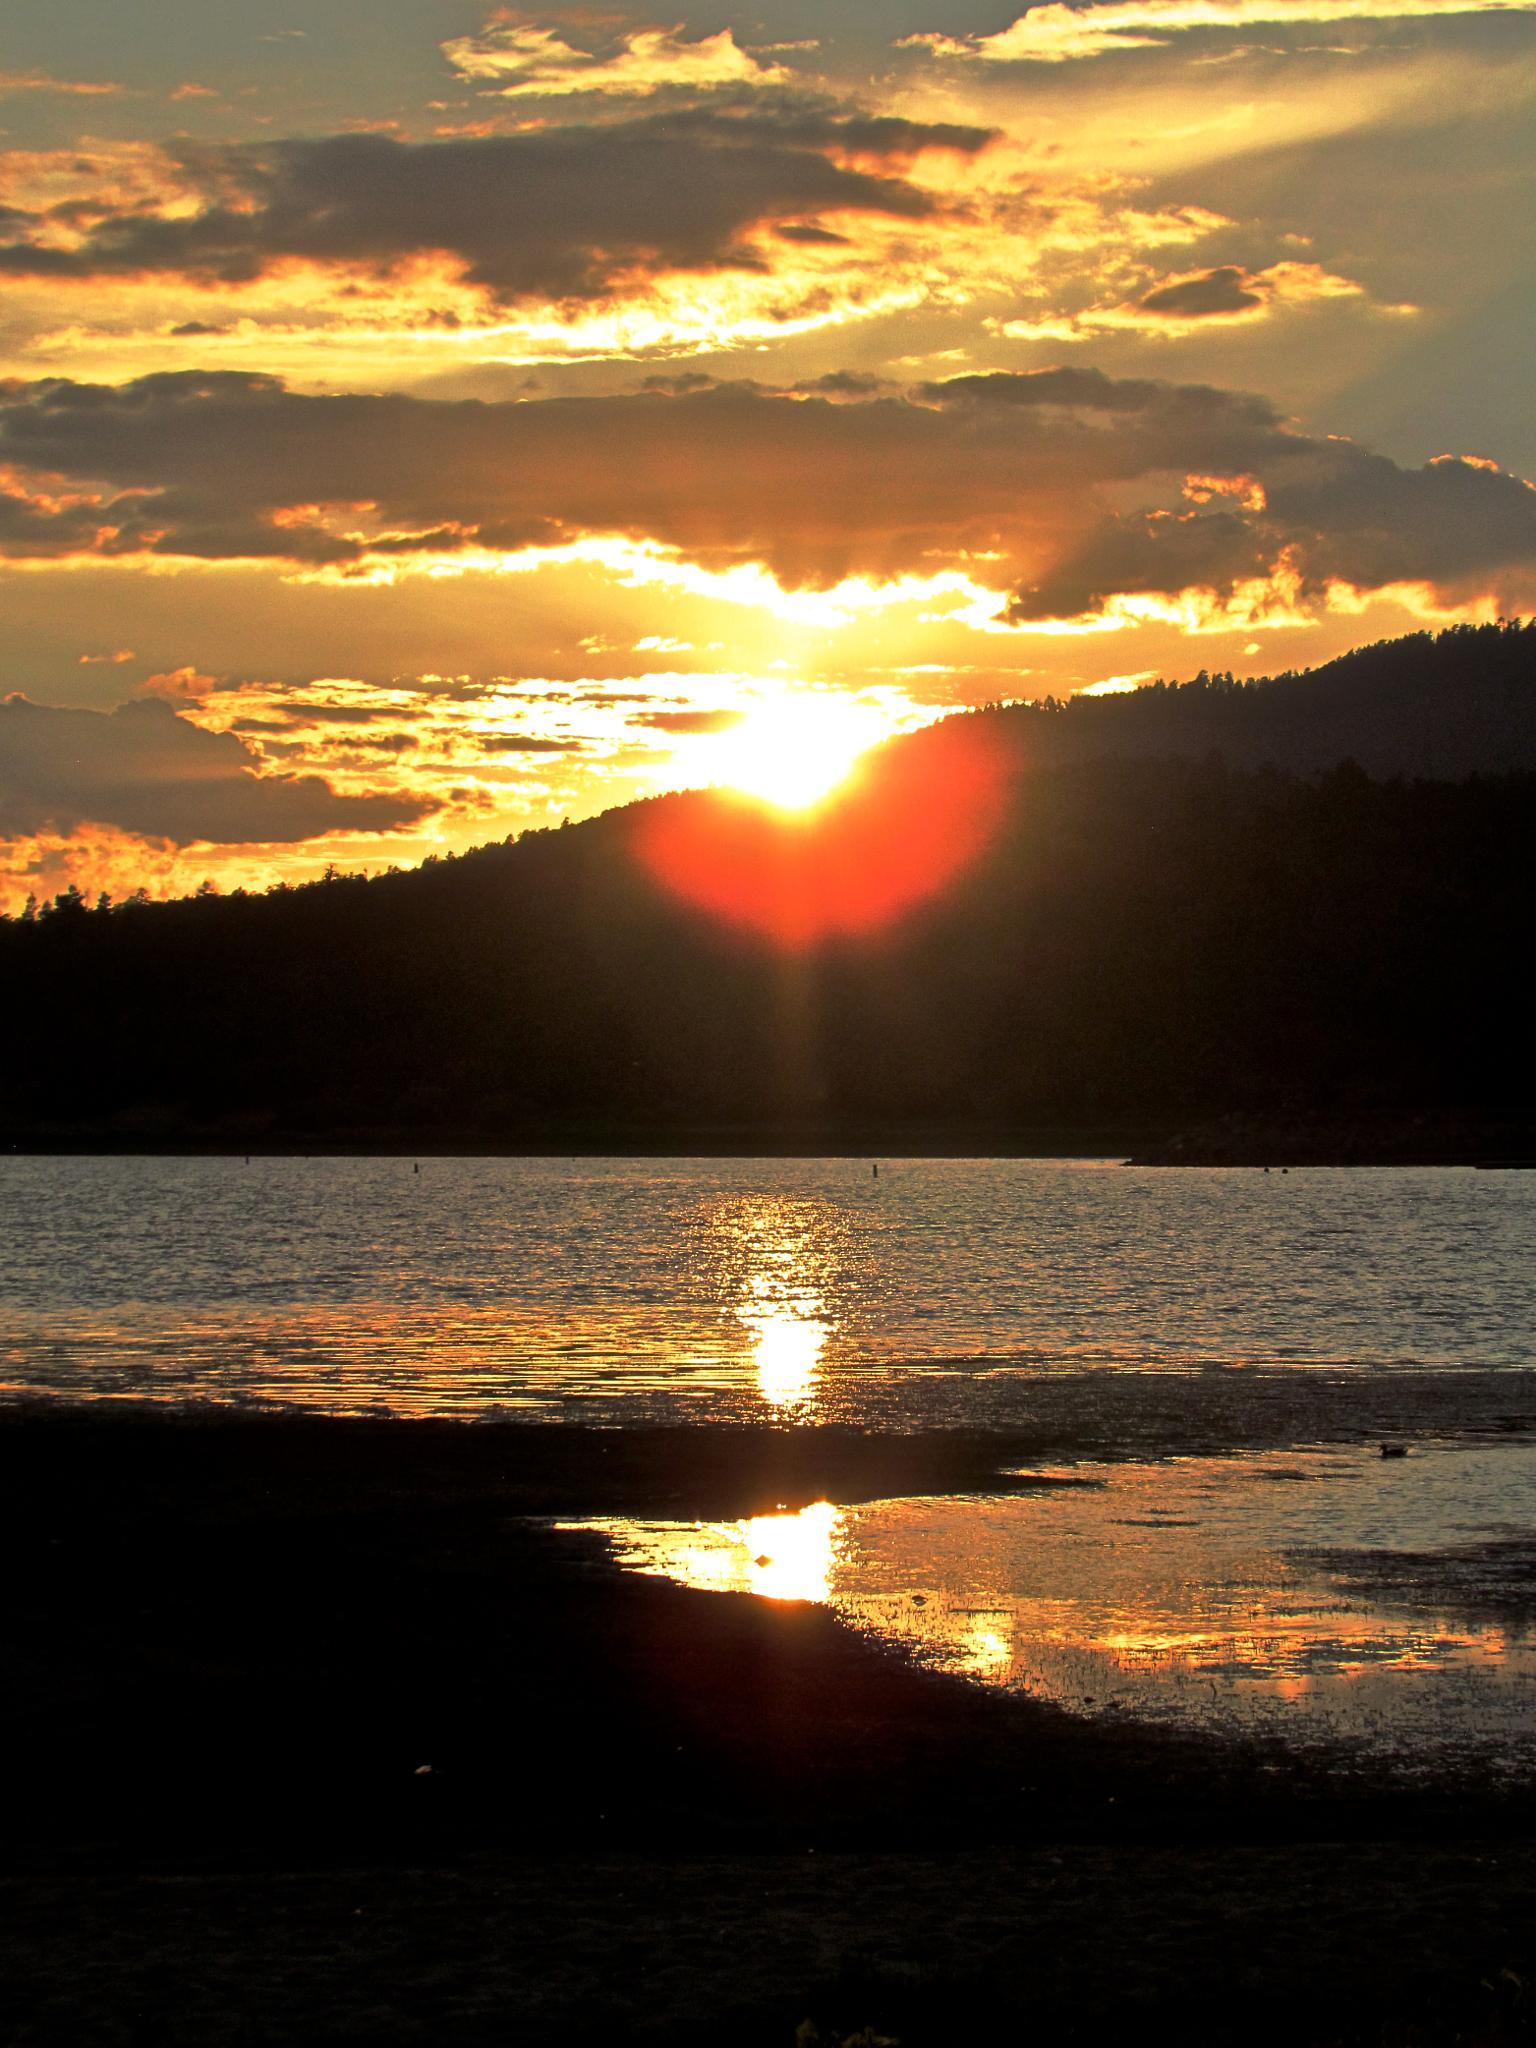 Sunset at Big Bear Lake by MelanieAnnePhillips